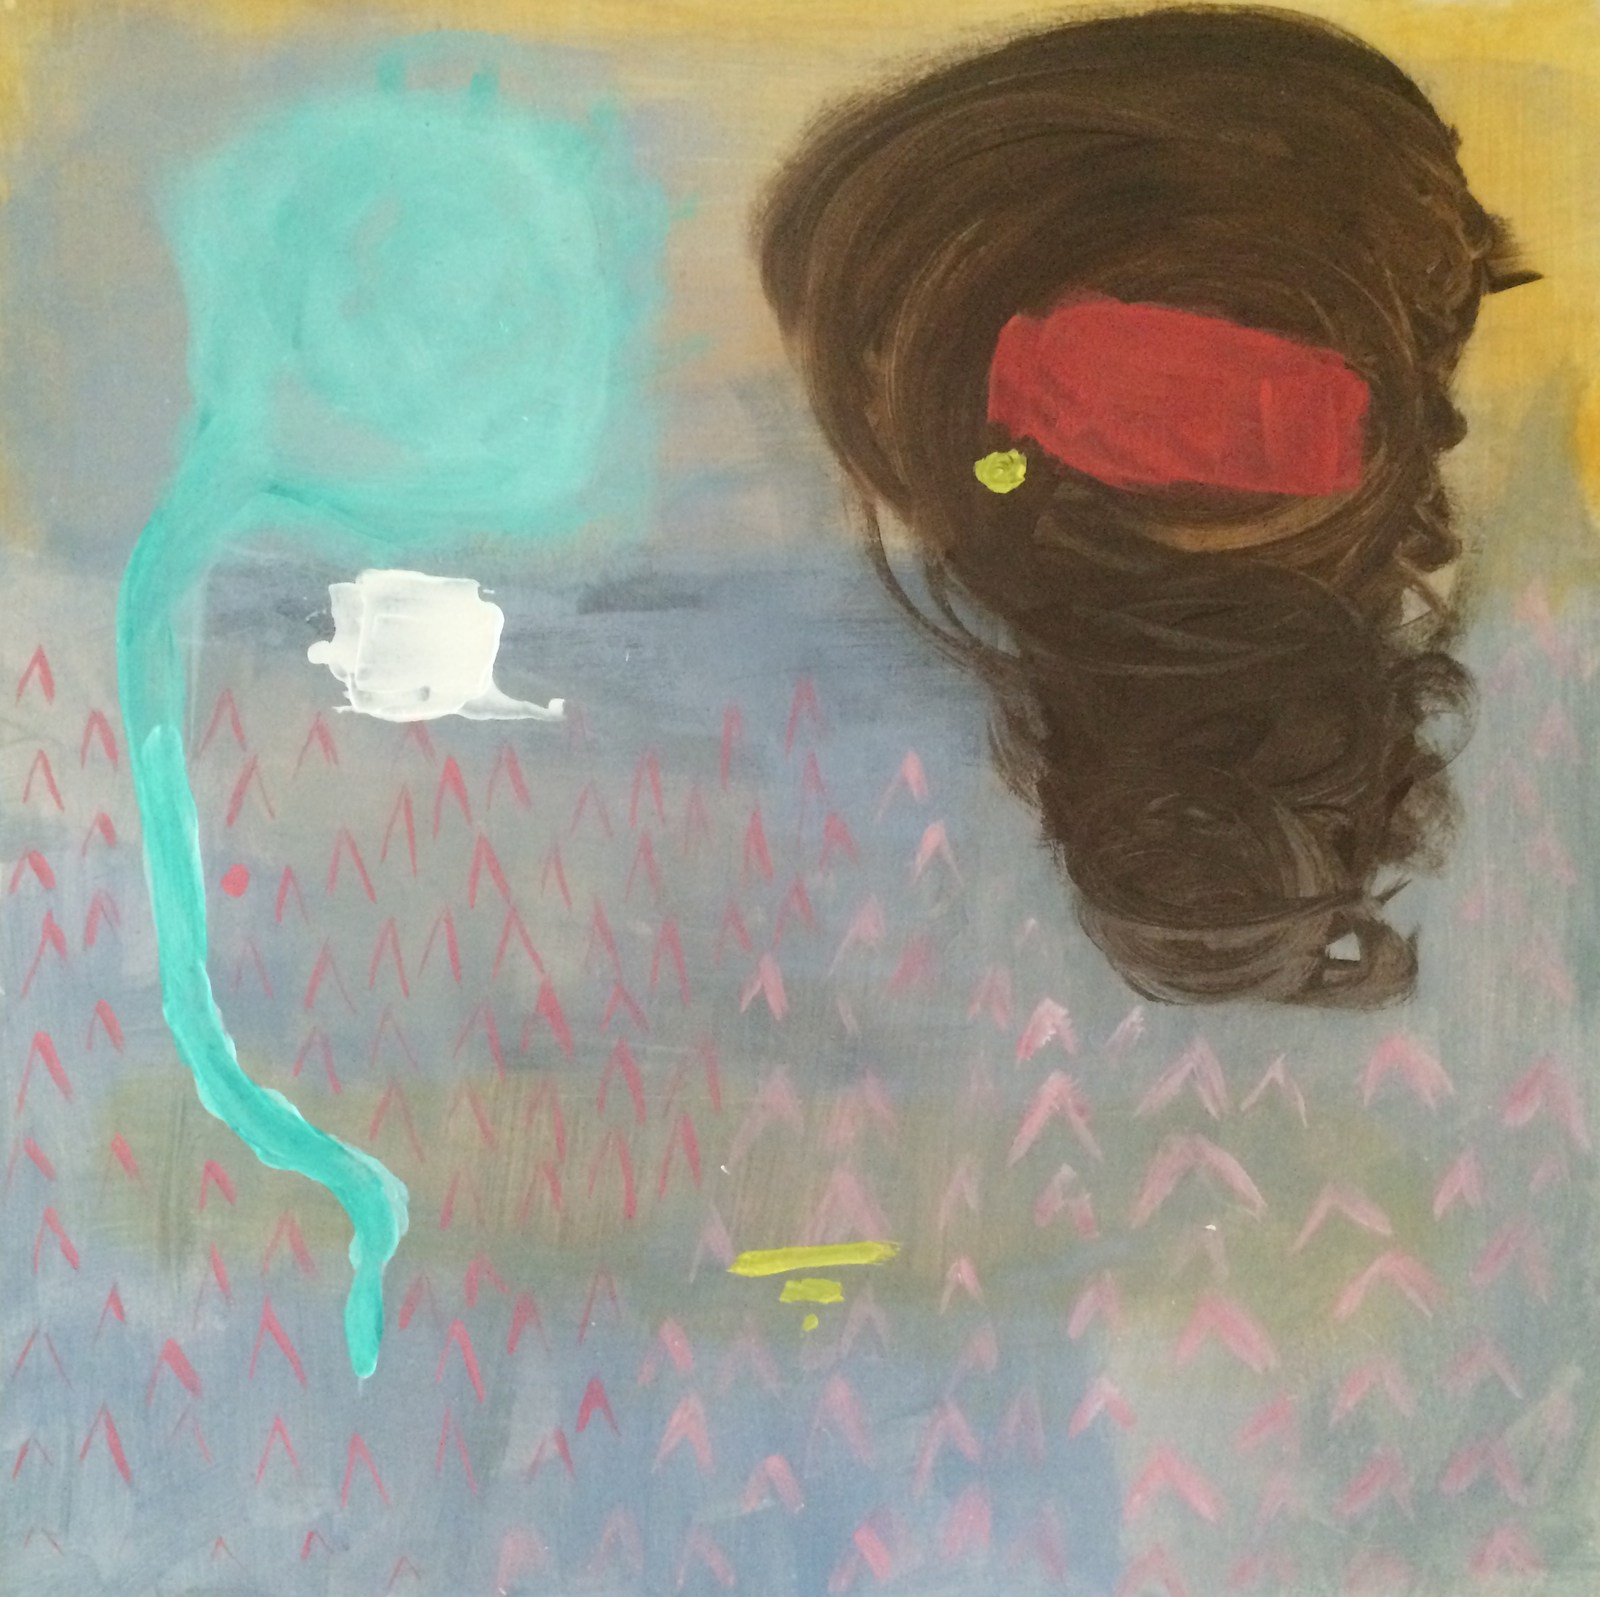 having a chat, 40 cm x 40 cm, acrylic on mdf, 2016, Jane Hughes